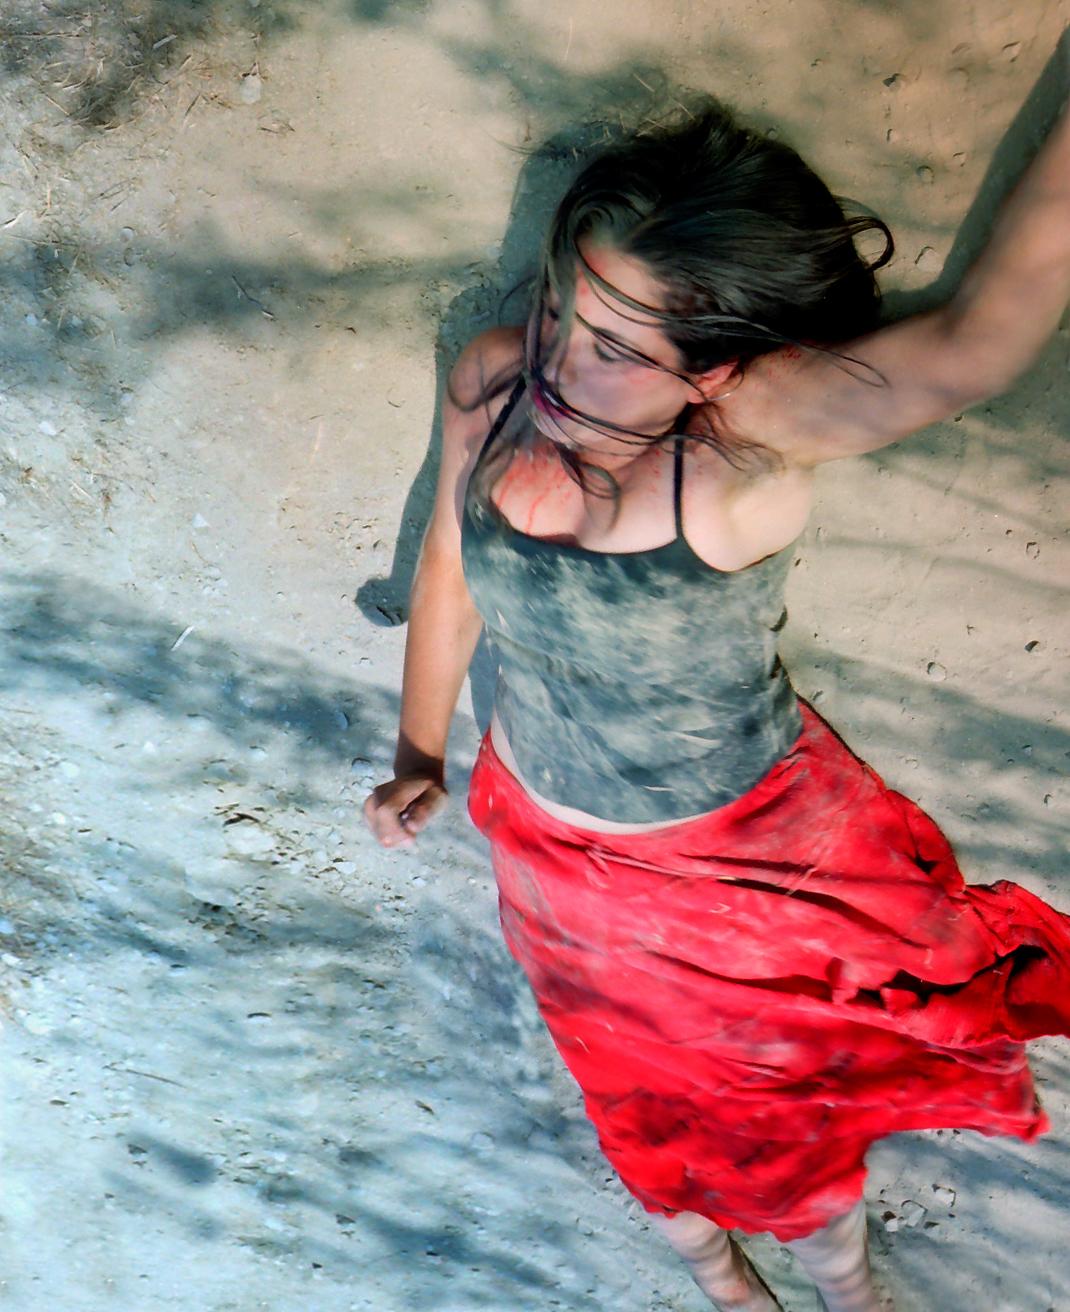 Juarez: Lily by Virginia Conesa-O'Gara